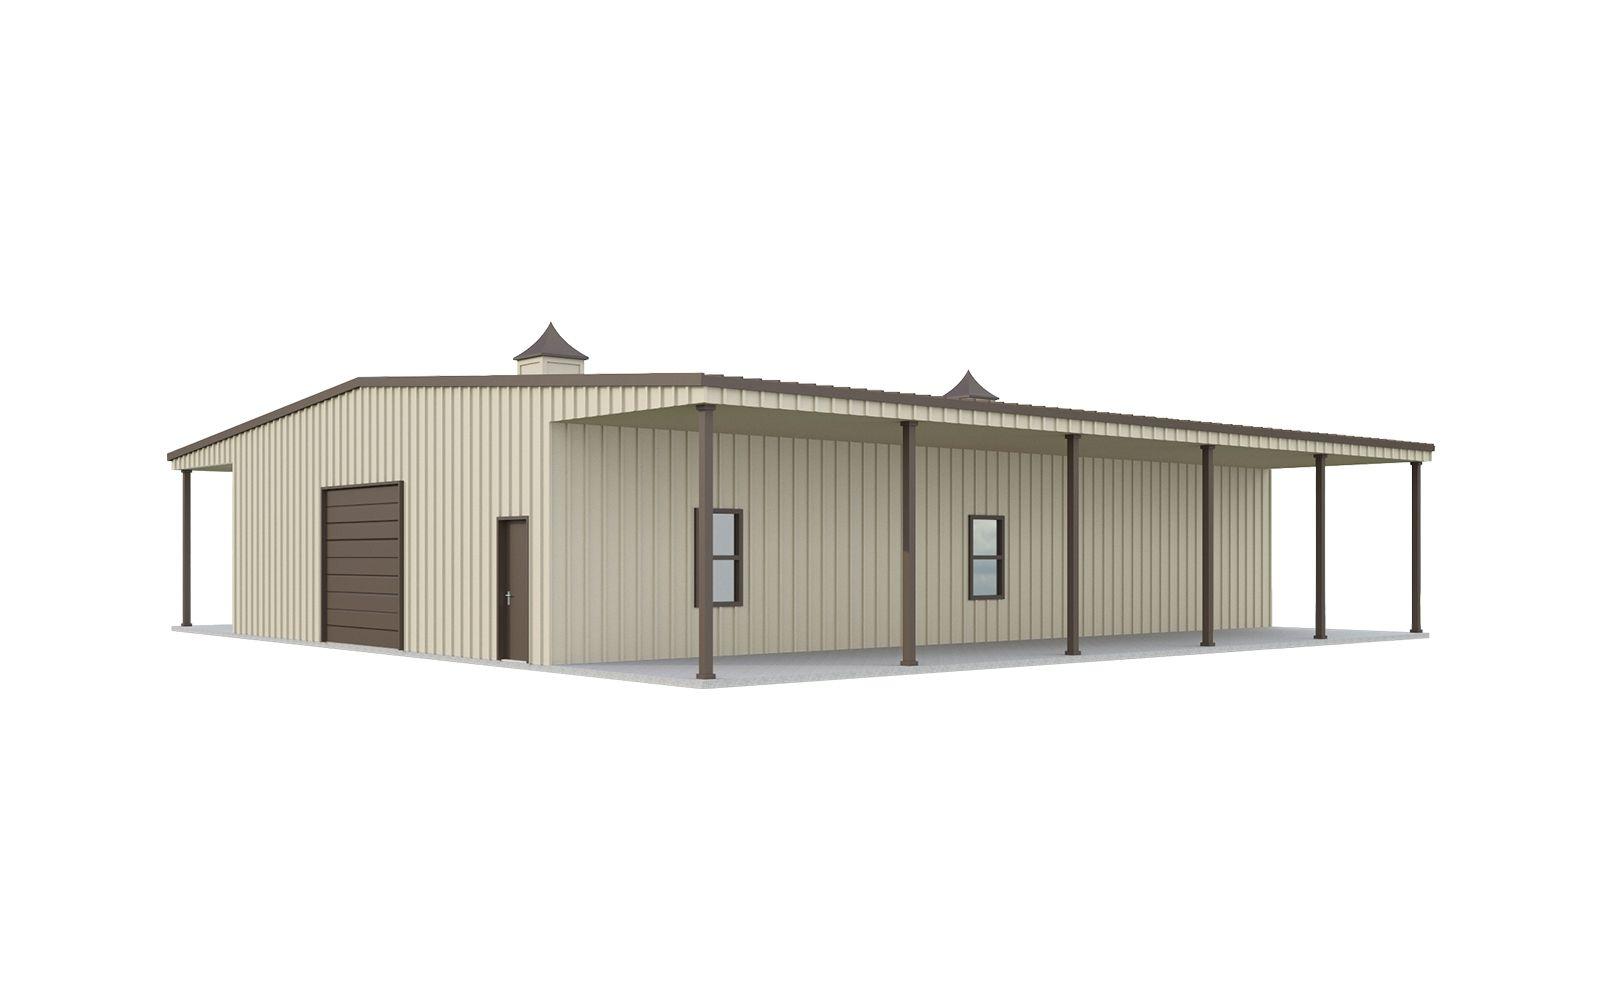 40x60 Metal Barn Kit Quick Prices General Steel Shop Metal Barn Kits Barn Kits Metal Shop Building